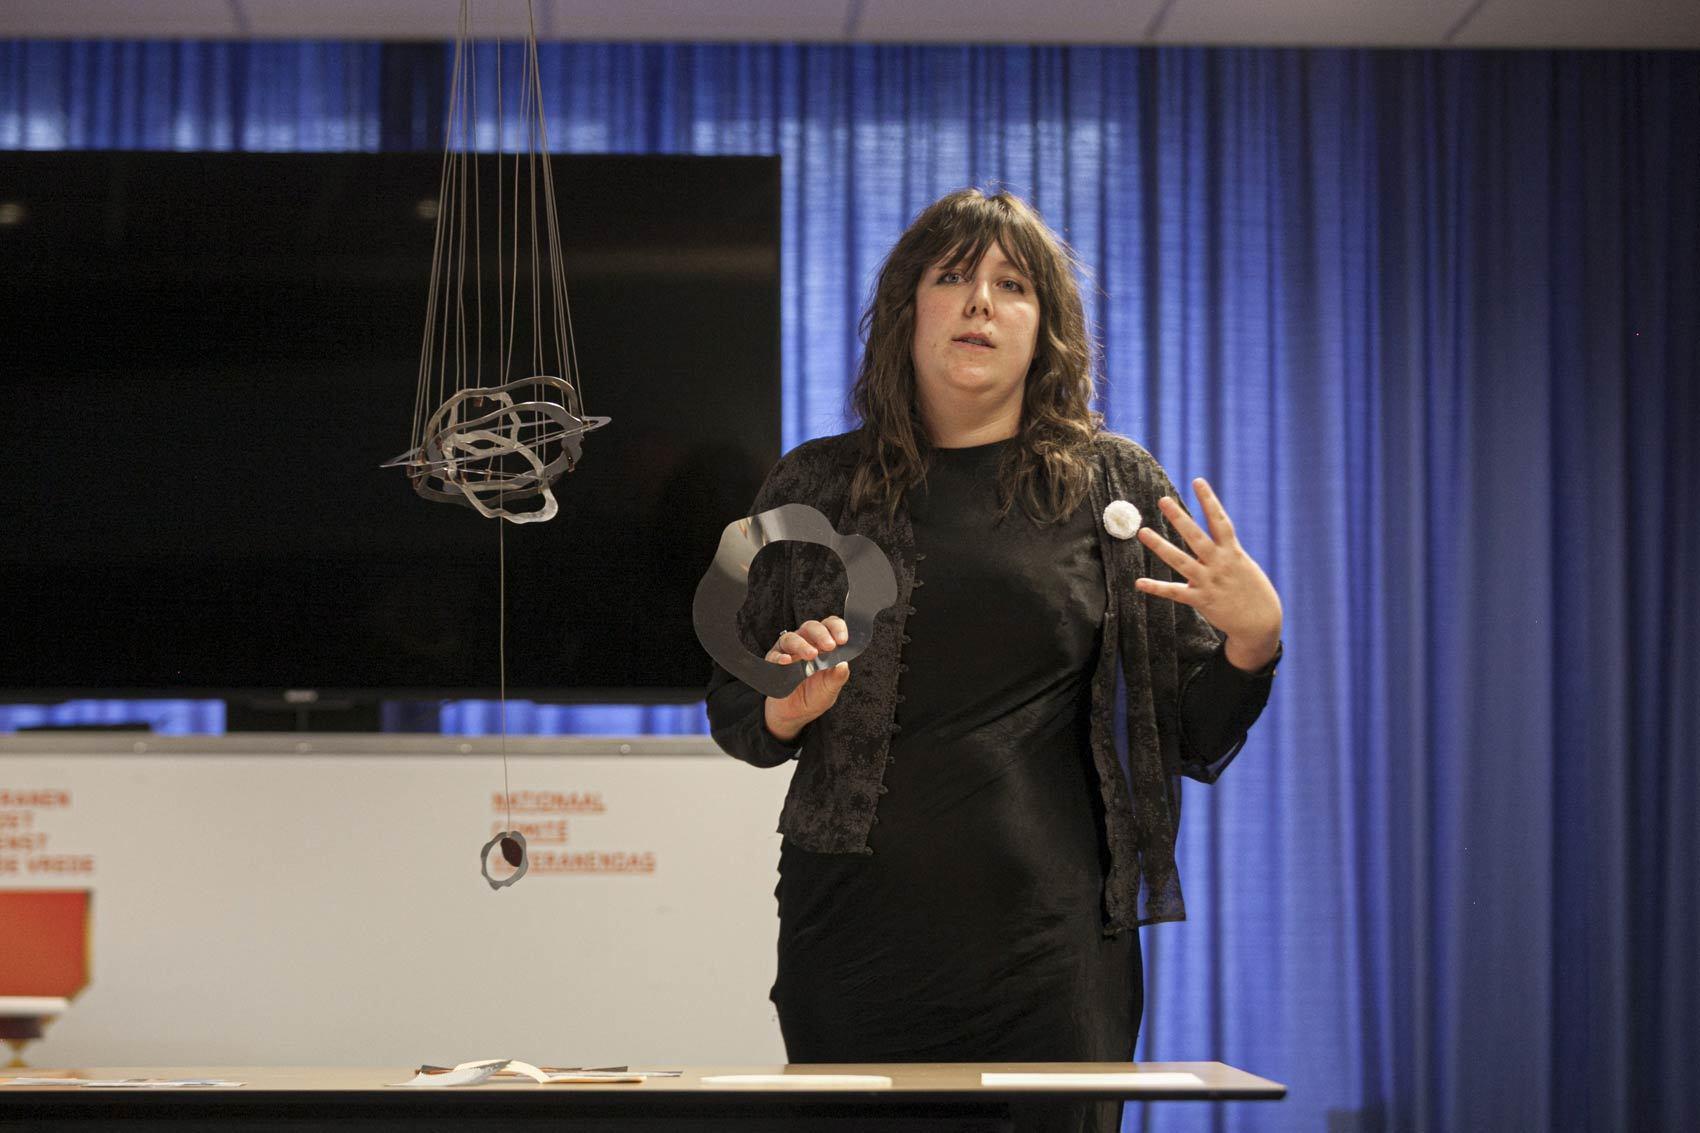 Maria Beaumaster - Witte Anjer Prijs ontwerpconcept 2020